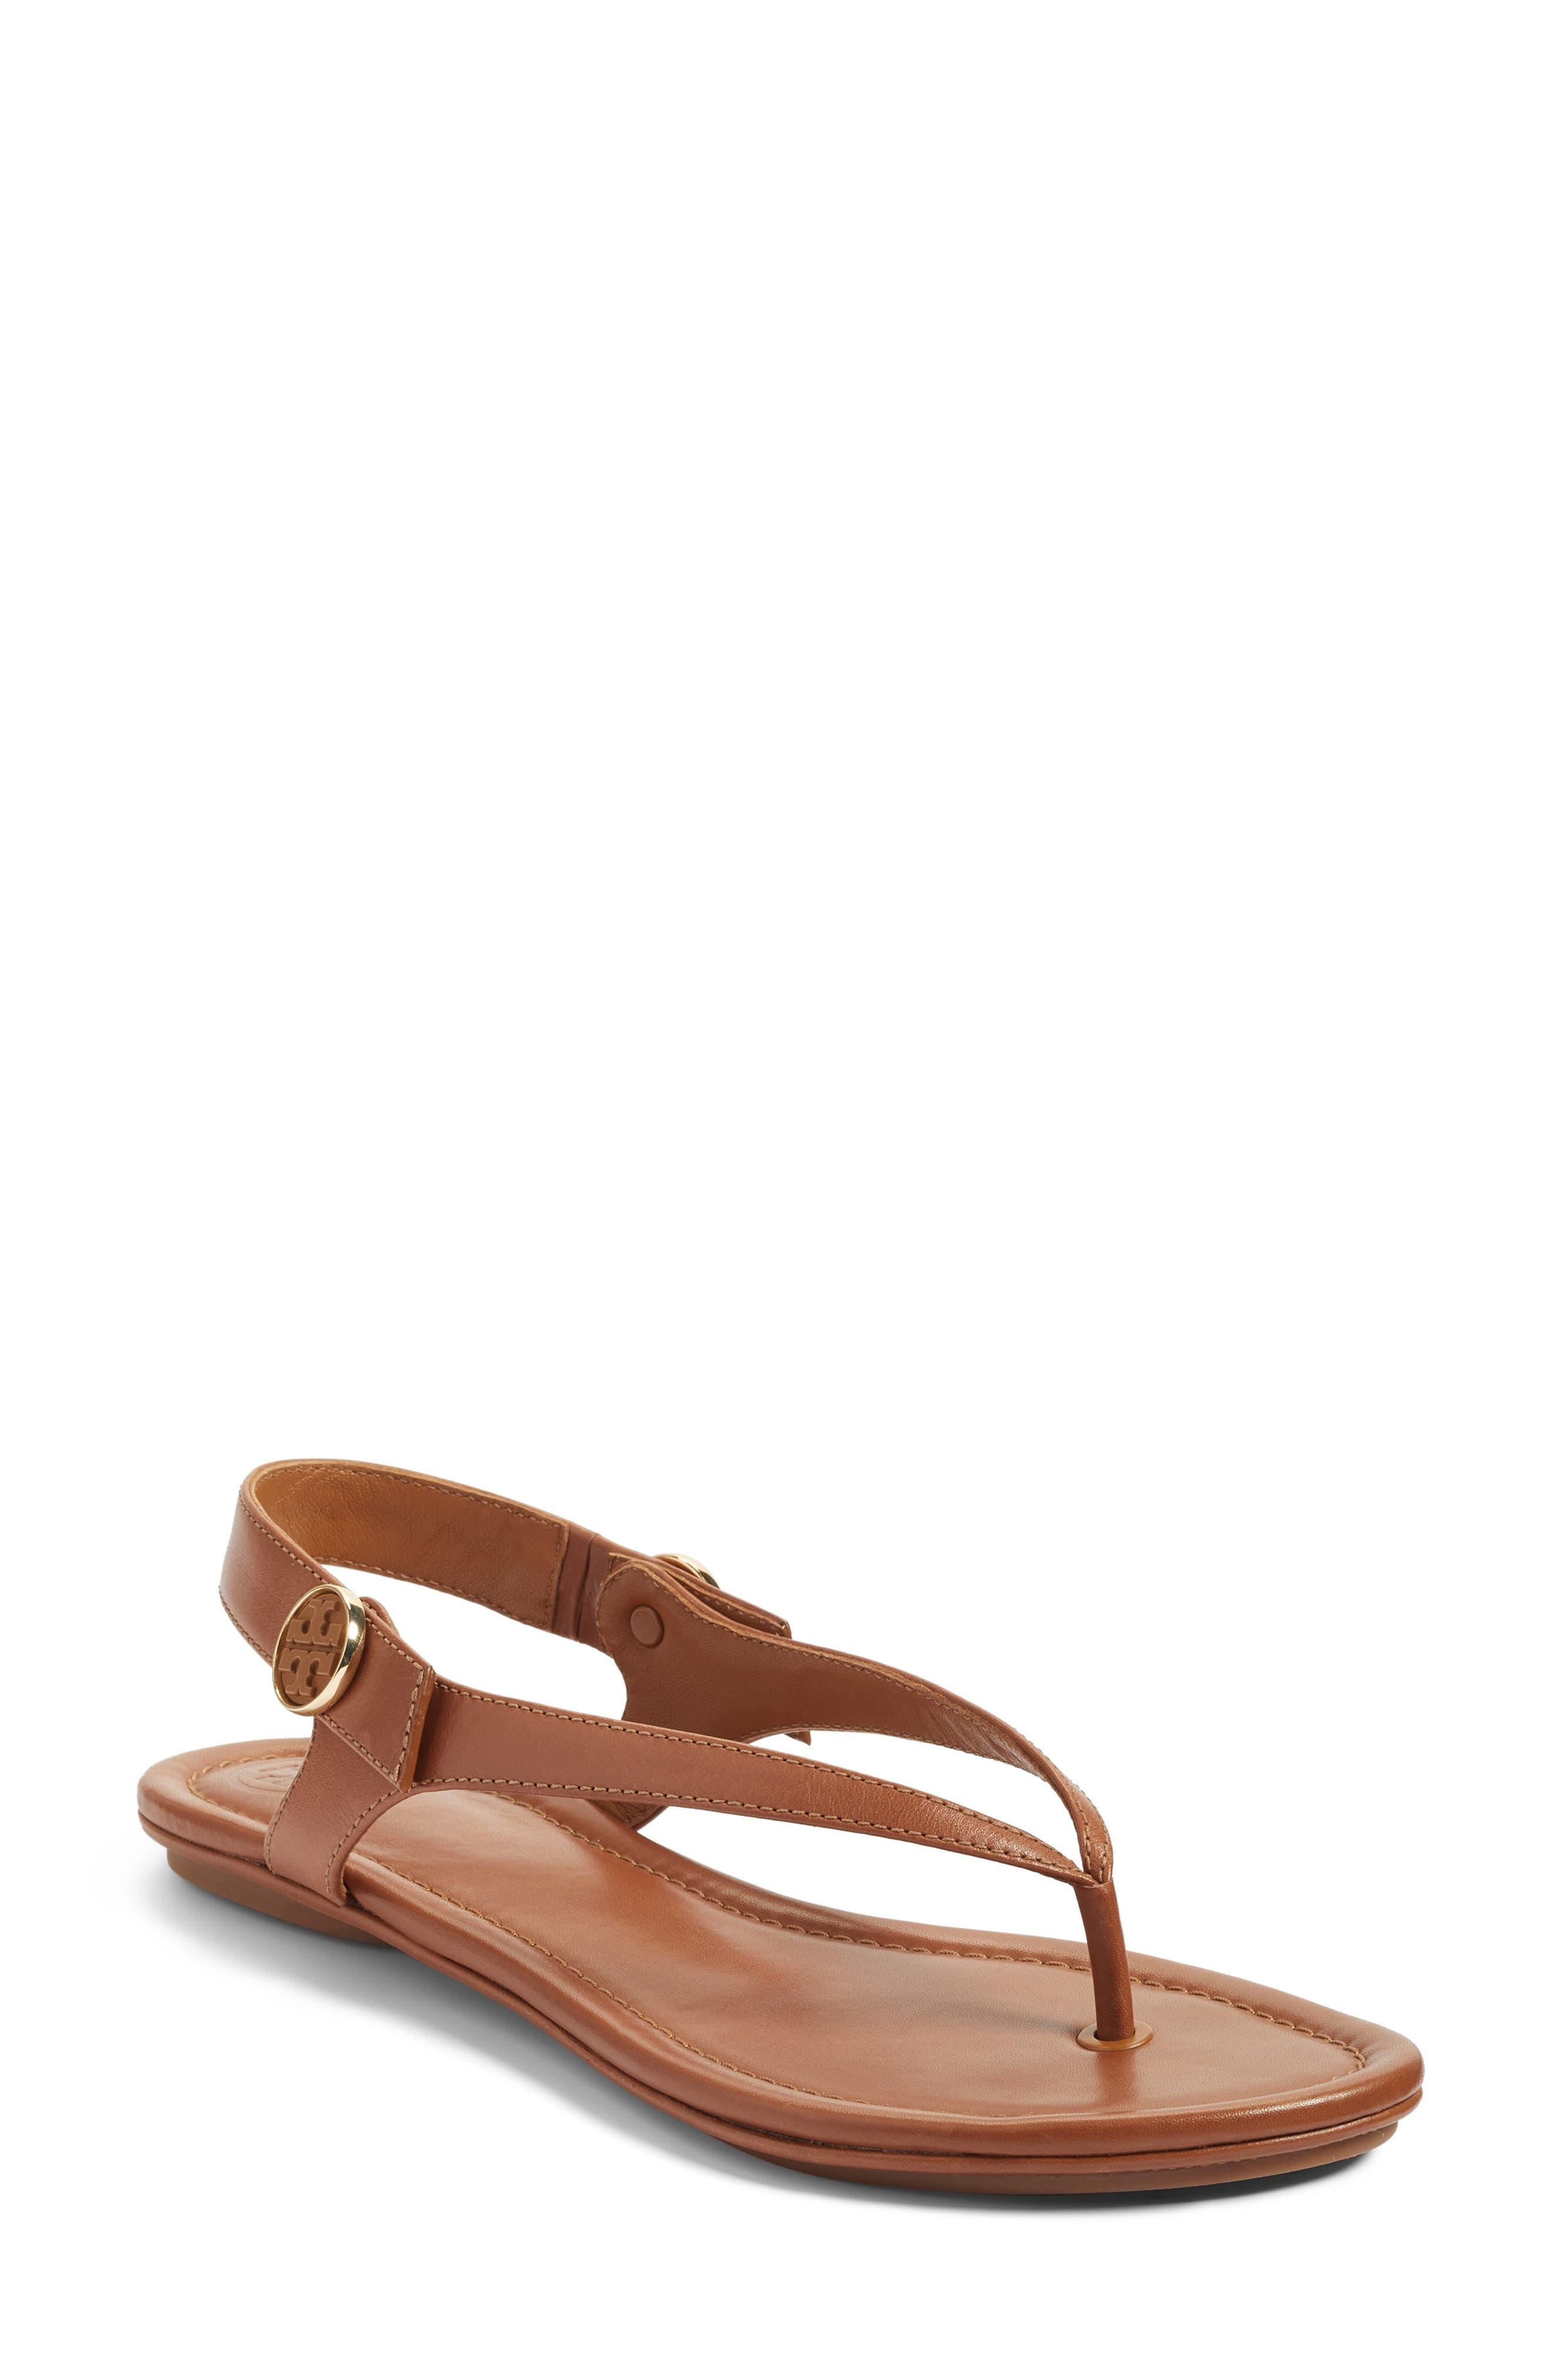 Alternate Image 1 Selected - Tory Burch Minnie Travel Thong Sandal (Women)